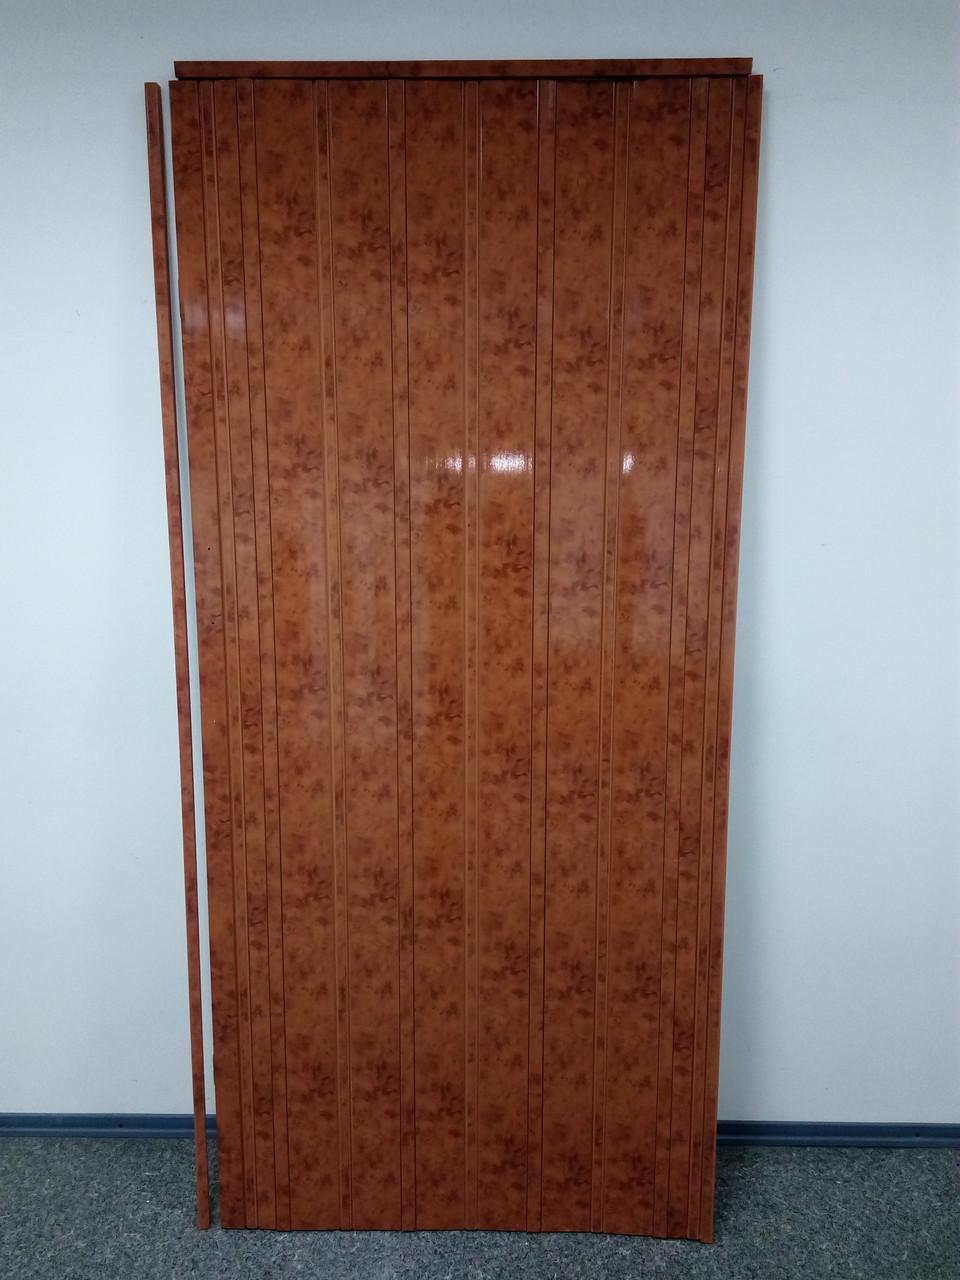 Дверь гармошка межкомнатная ЭЛИТ, 4785 мрамор темный, 880*2030*10 мм